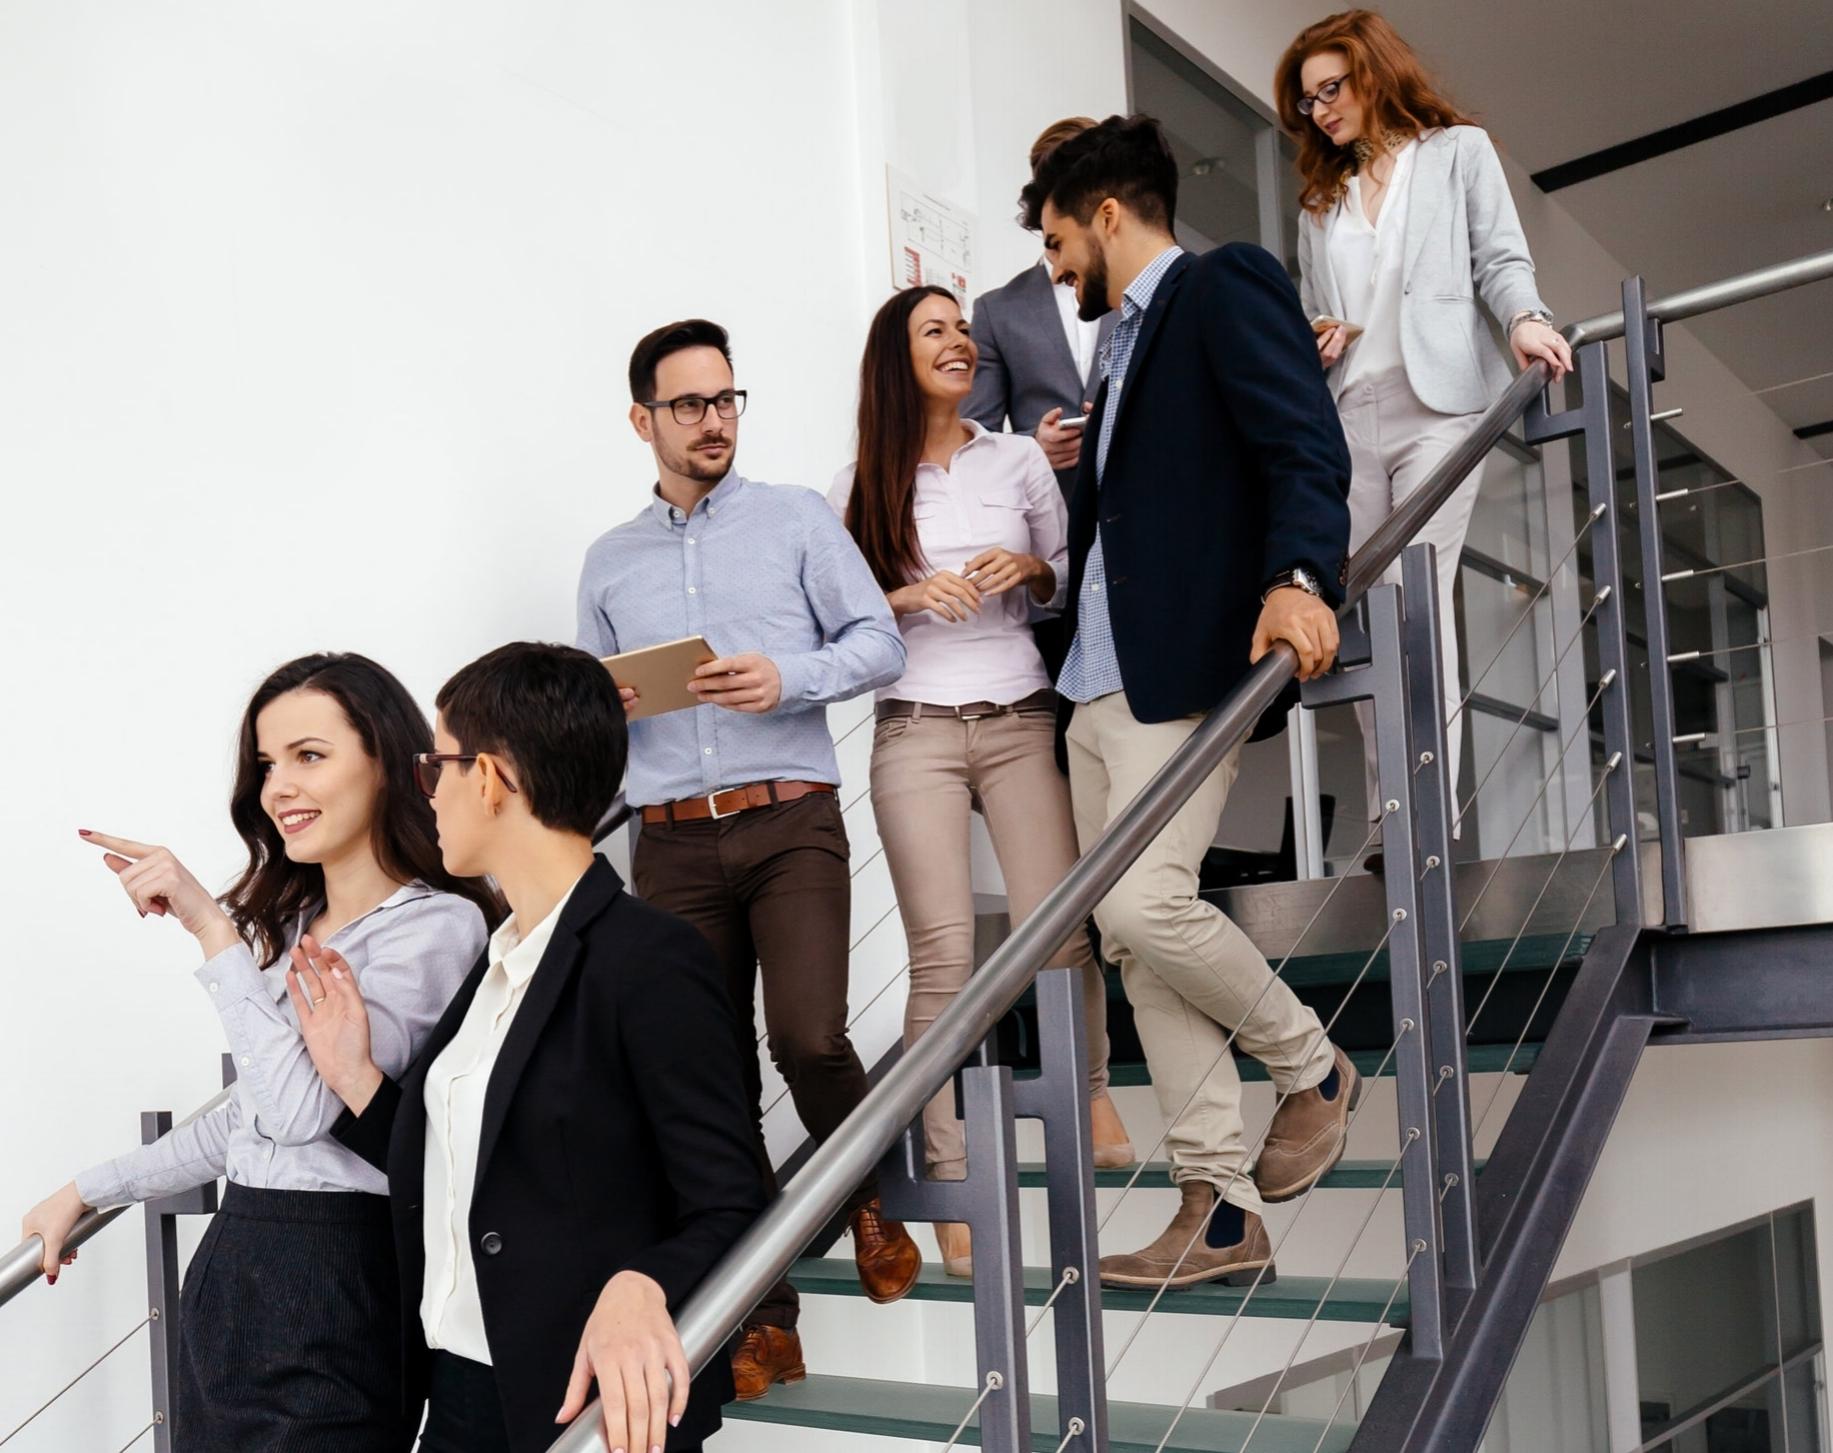 Business people on stairs.jpg